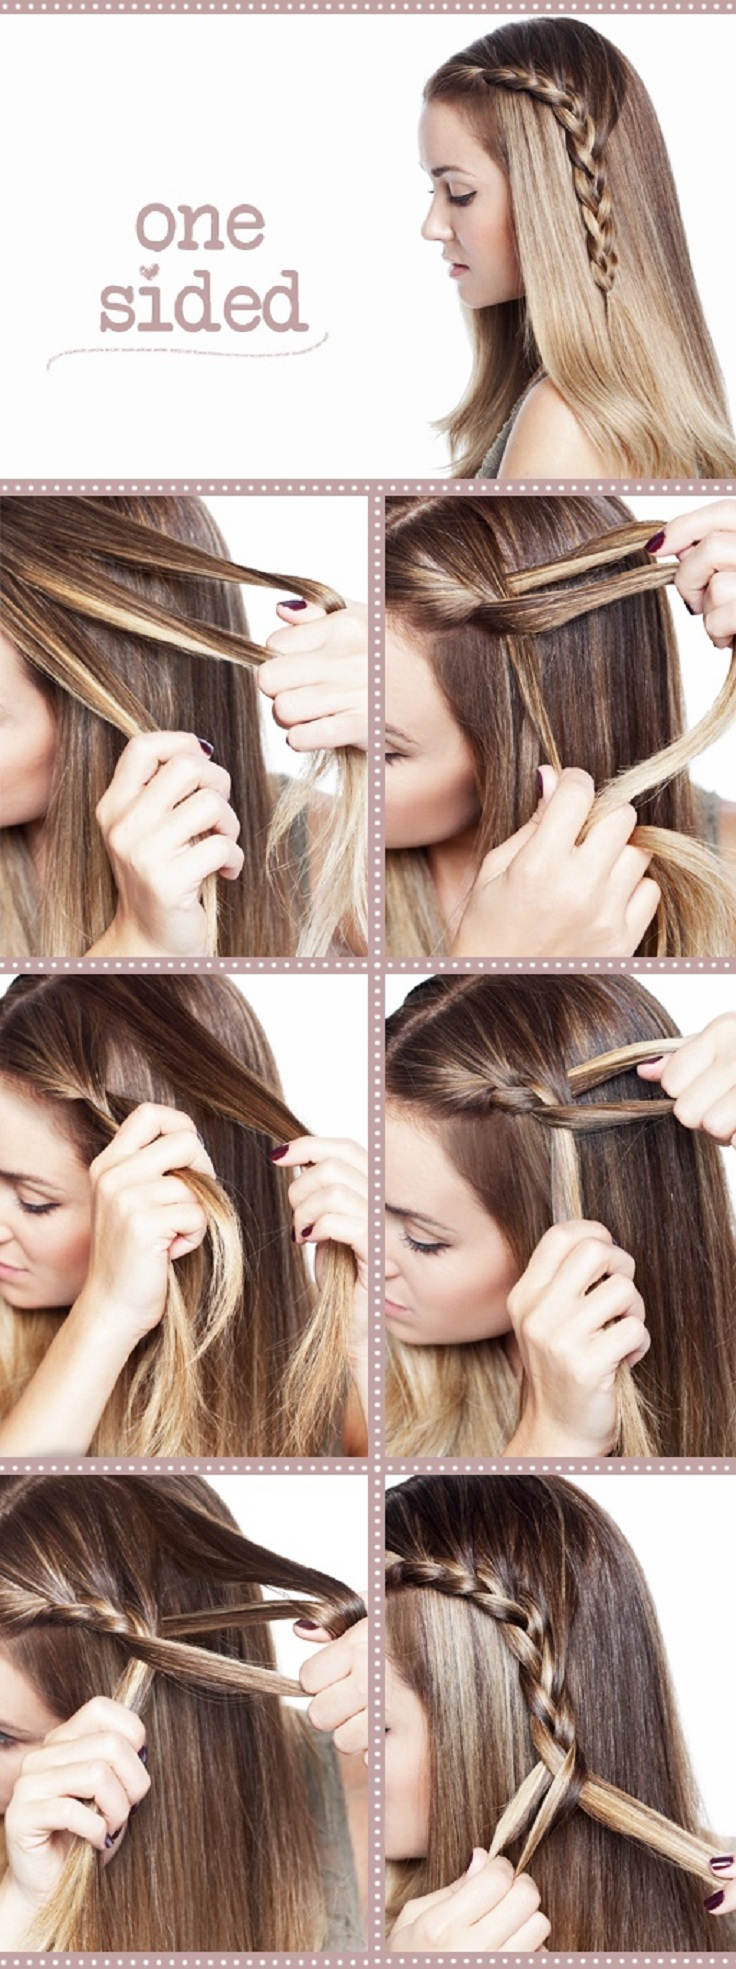 top-10-braid-tutorials_06